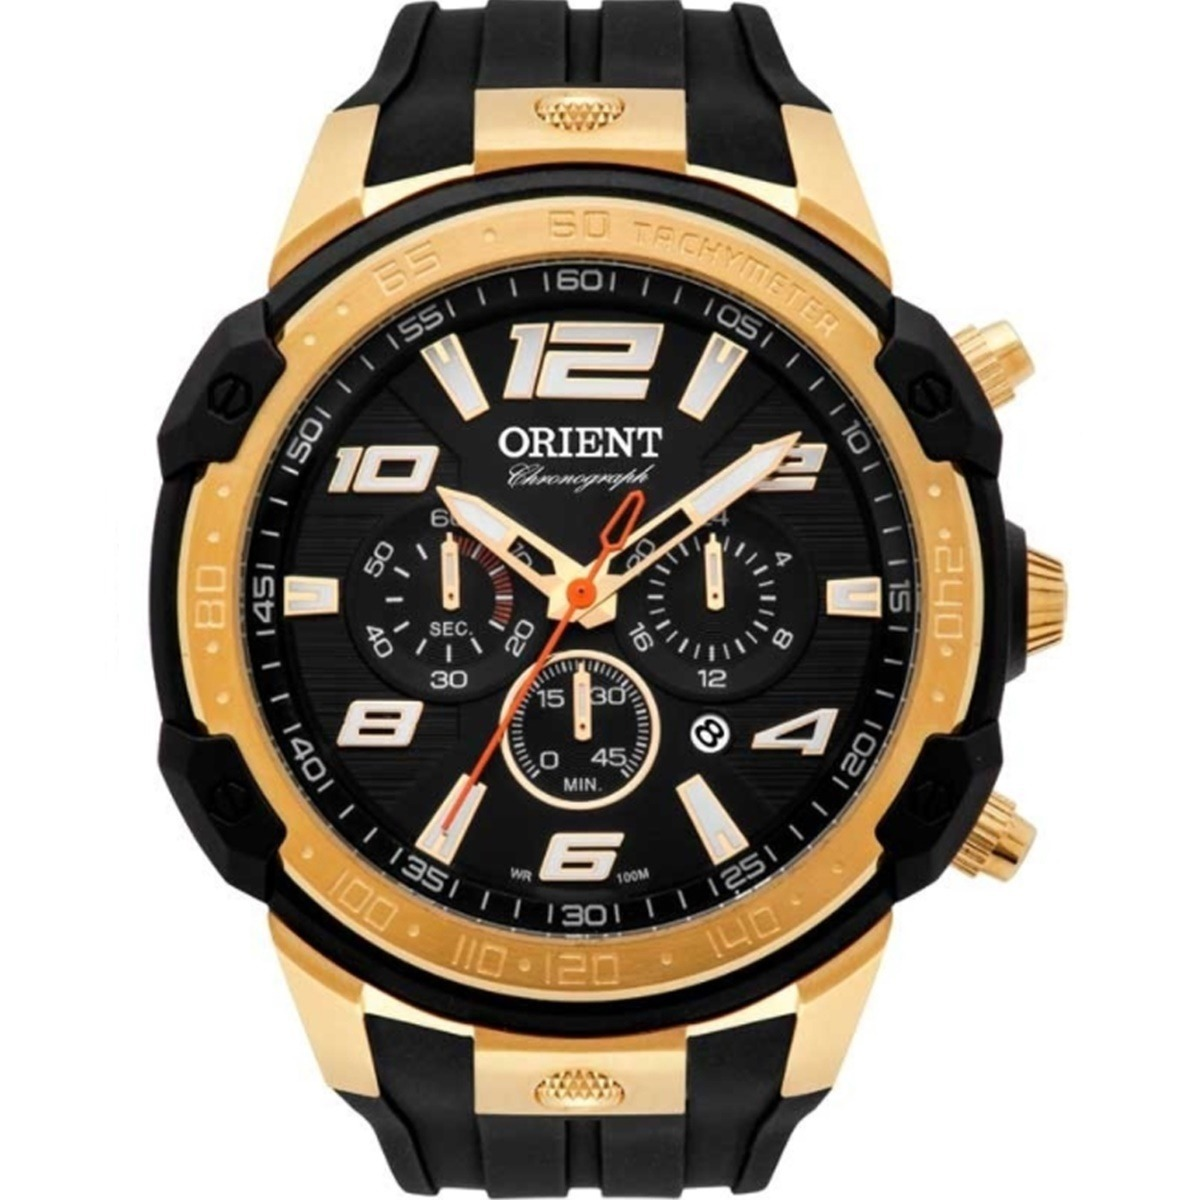 34fcf19eedd relógio orient masculino esportivo preto e dourado mgspc004a. Carregando  zoom.